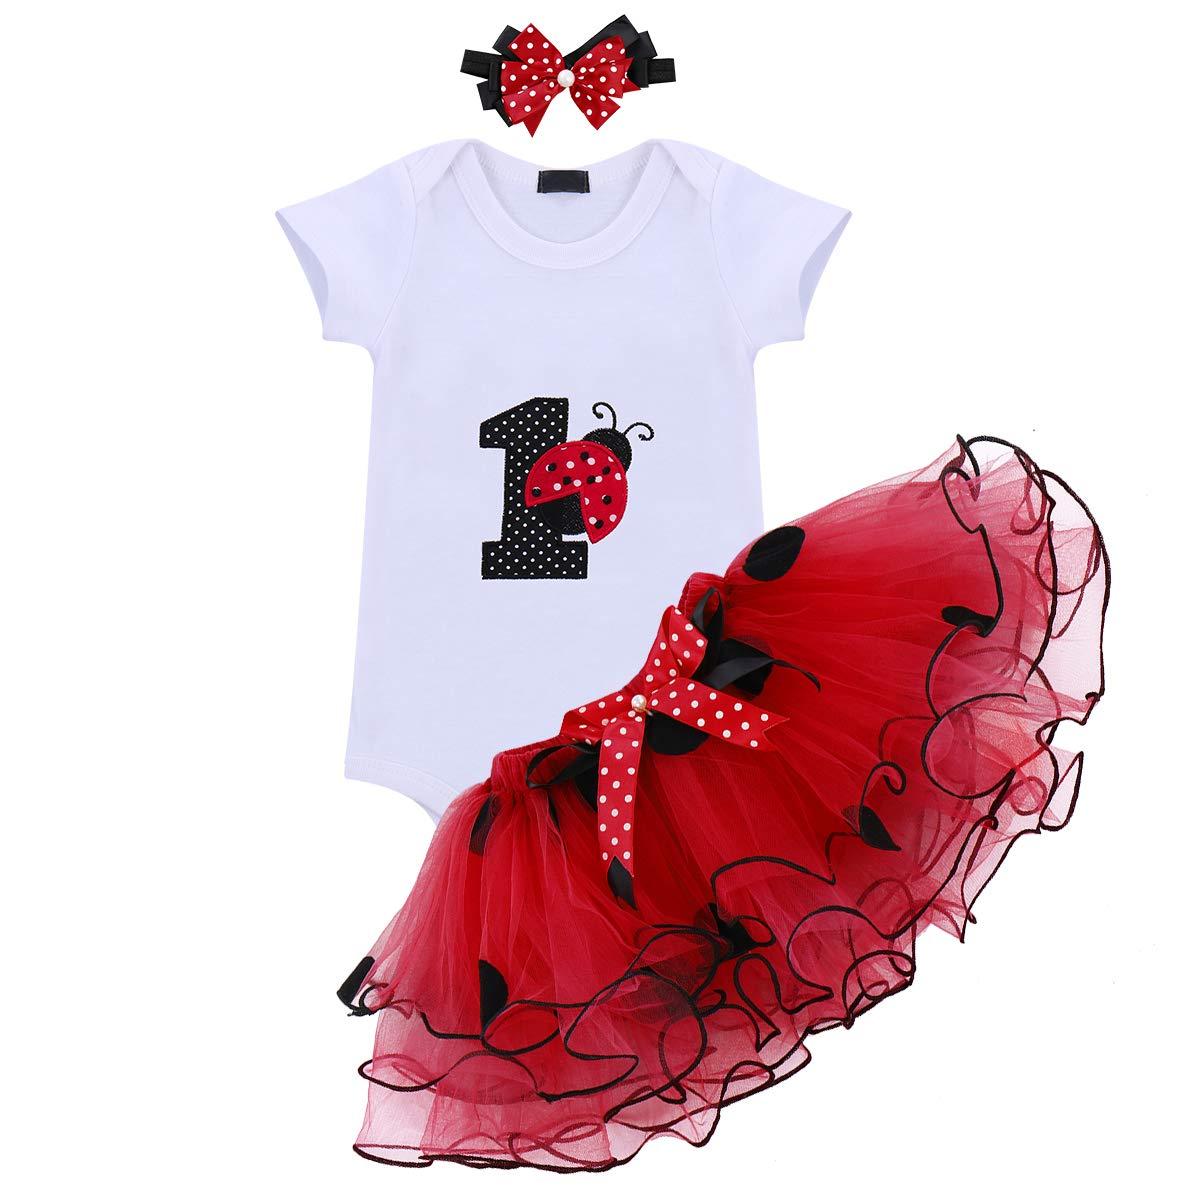 00bfe07467d51 OwlFay Wild/Unicorn/Ladybug One Year Baby Girls 1st Birthday Dress Tutu  Outfits Cotton One Piece Tutu Romper Skirt Princess Party Dress Cake Smash  Outfit ...